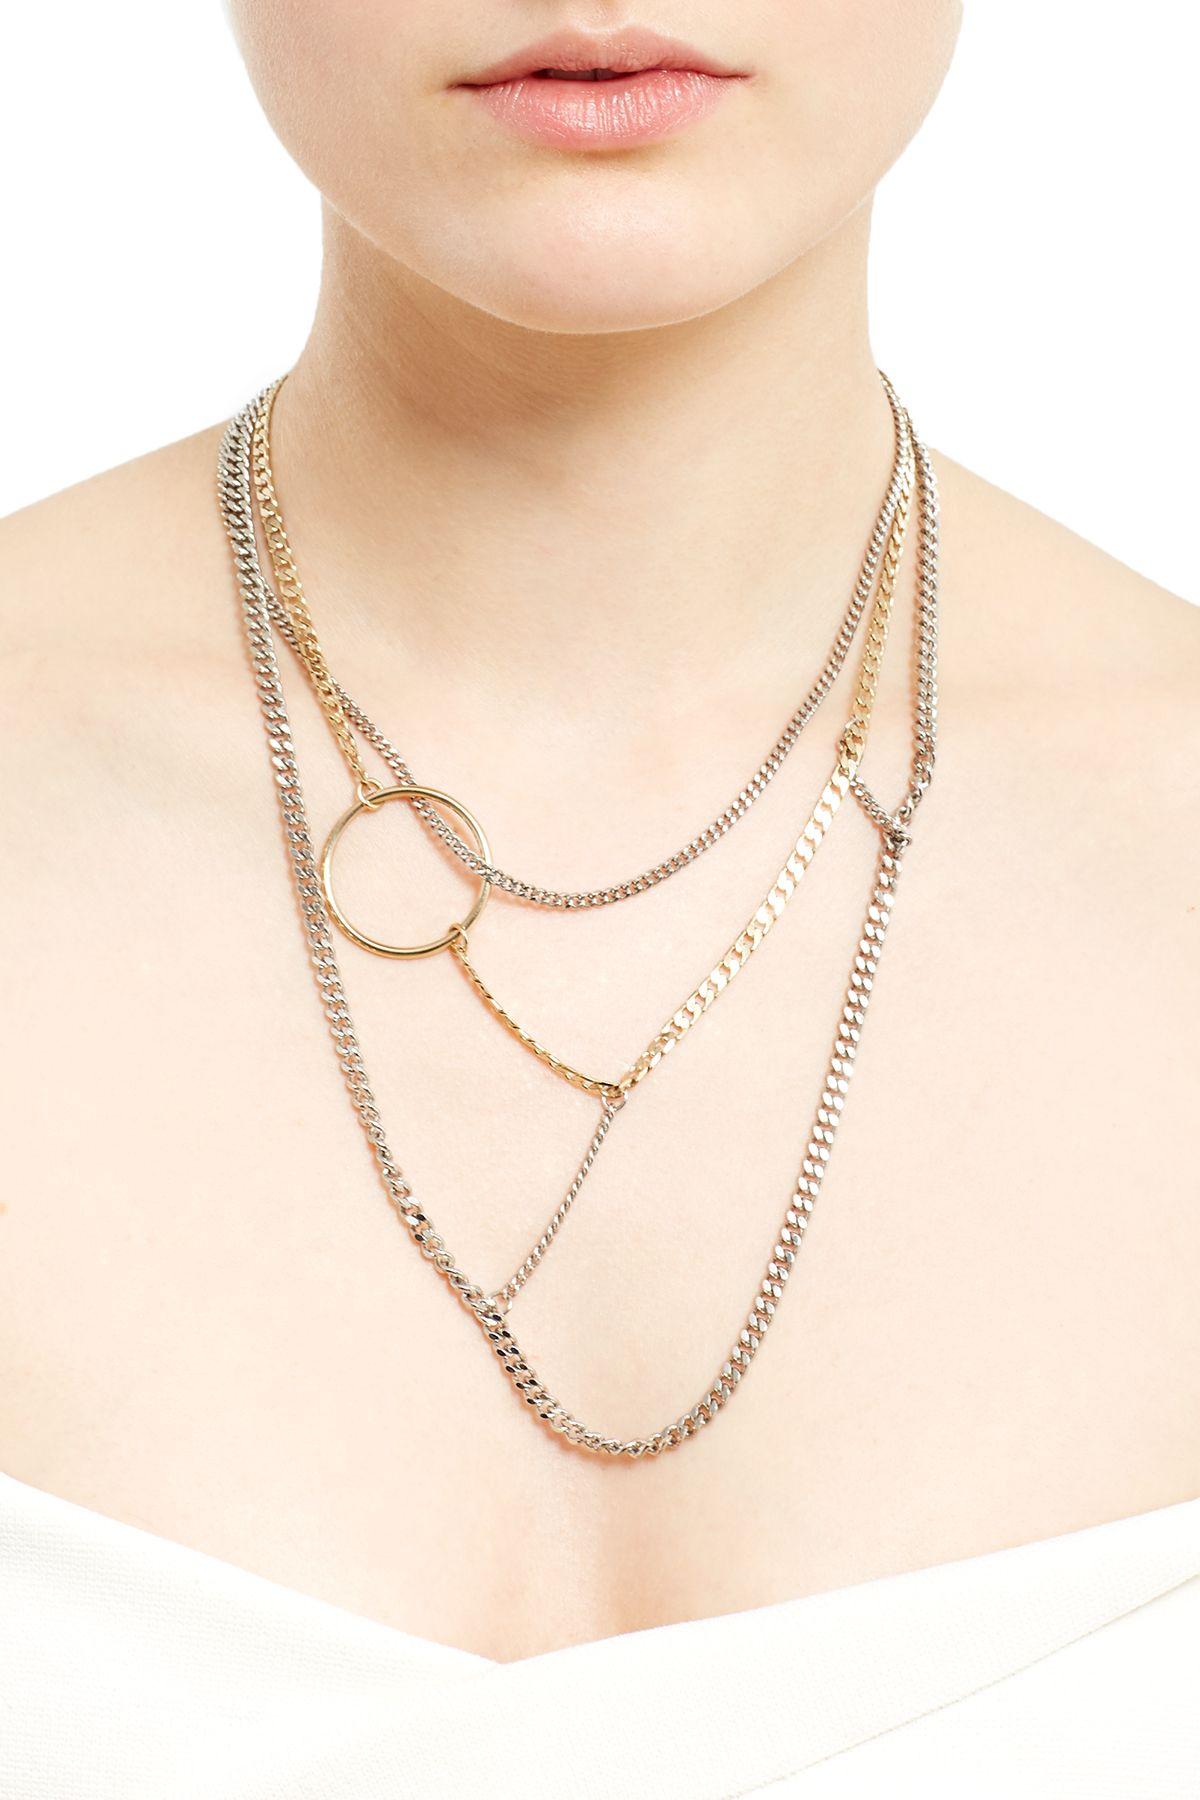 Justine Clenquet Naomie Choker - WOMEN - Jewelry - Justine Clenquet - OPENING…